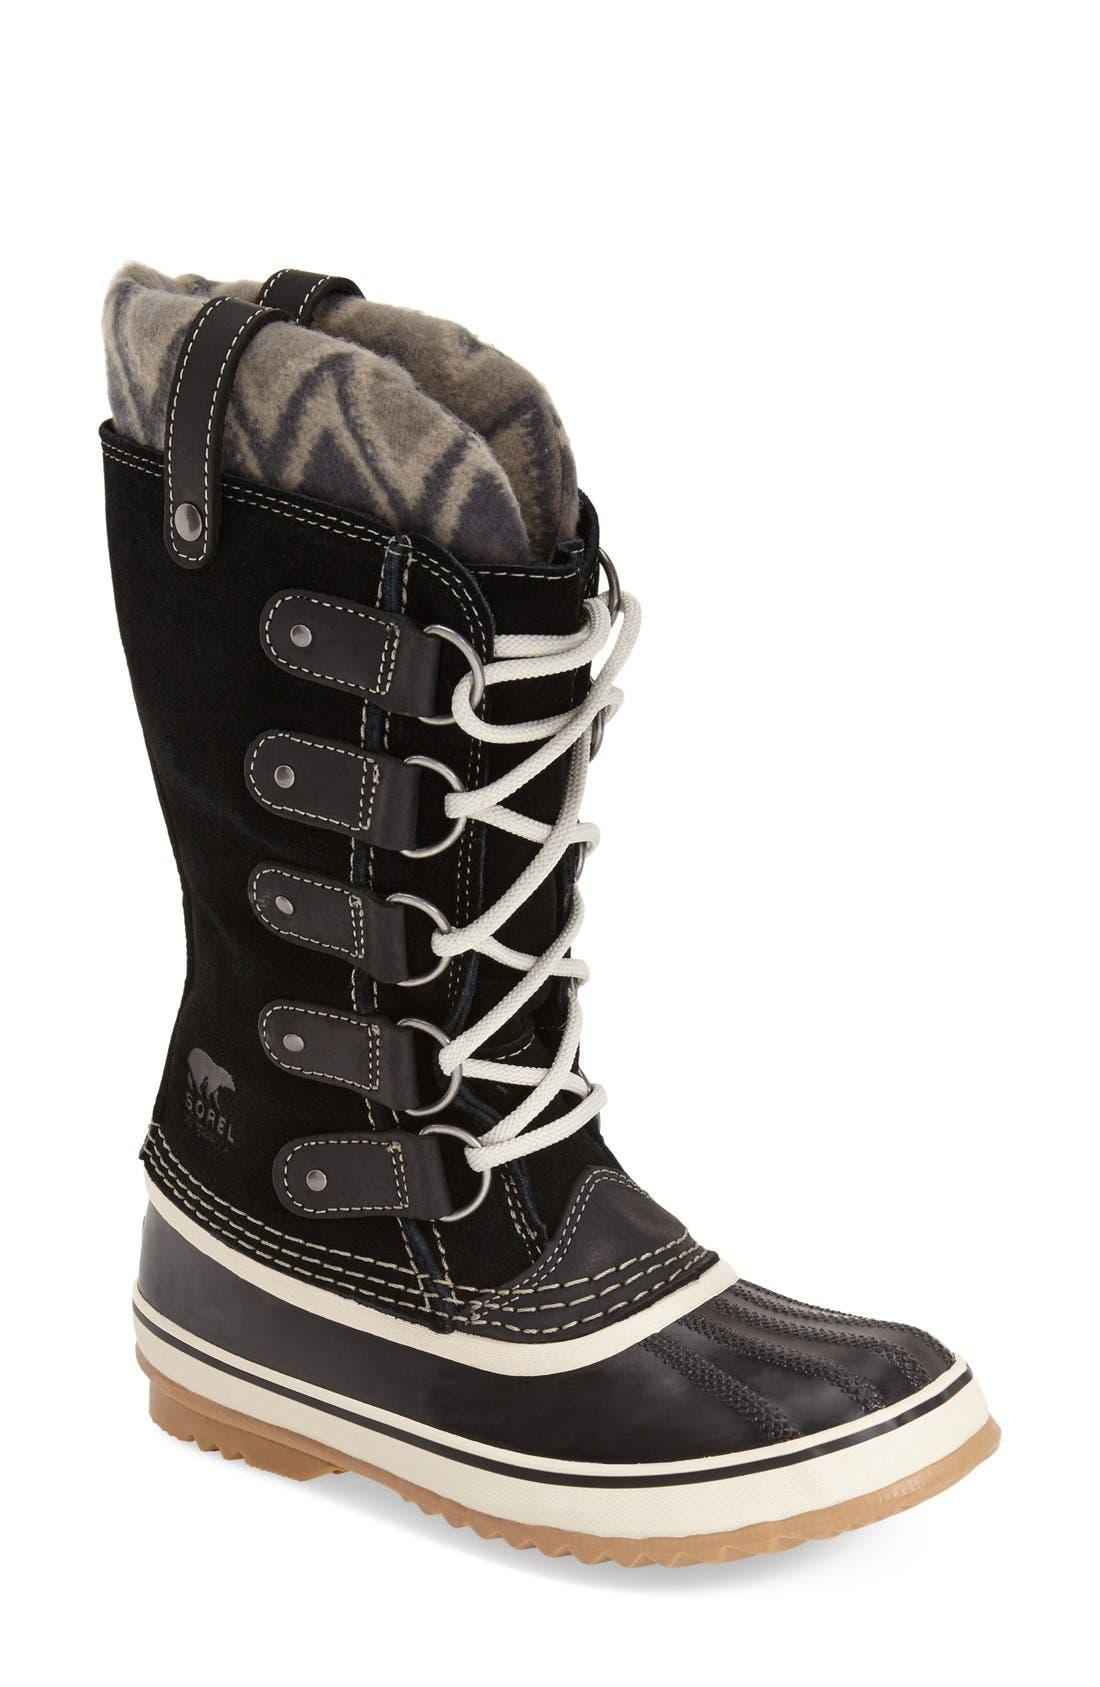 'Joan of Arctic - Knit II' Waterproof Boot,                             Main thumbnail 1, color,                             Black